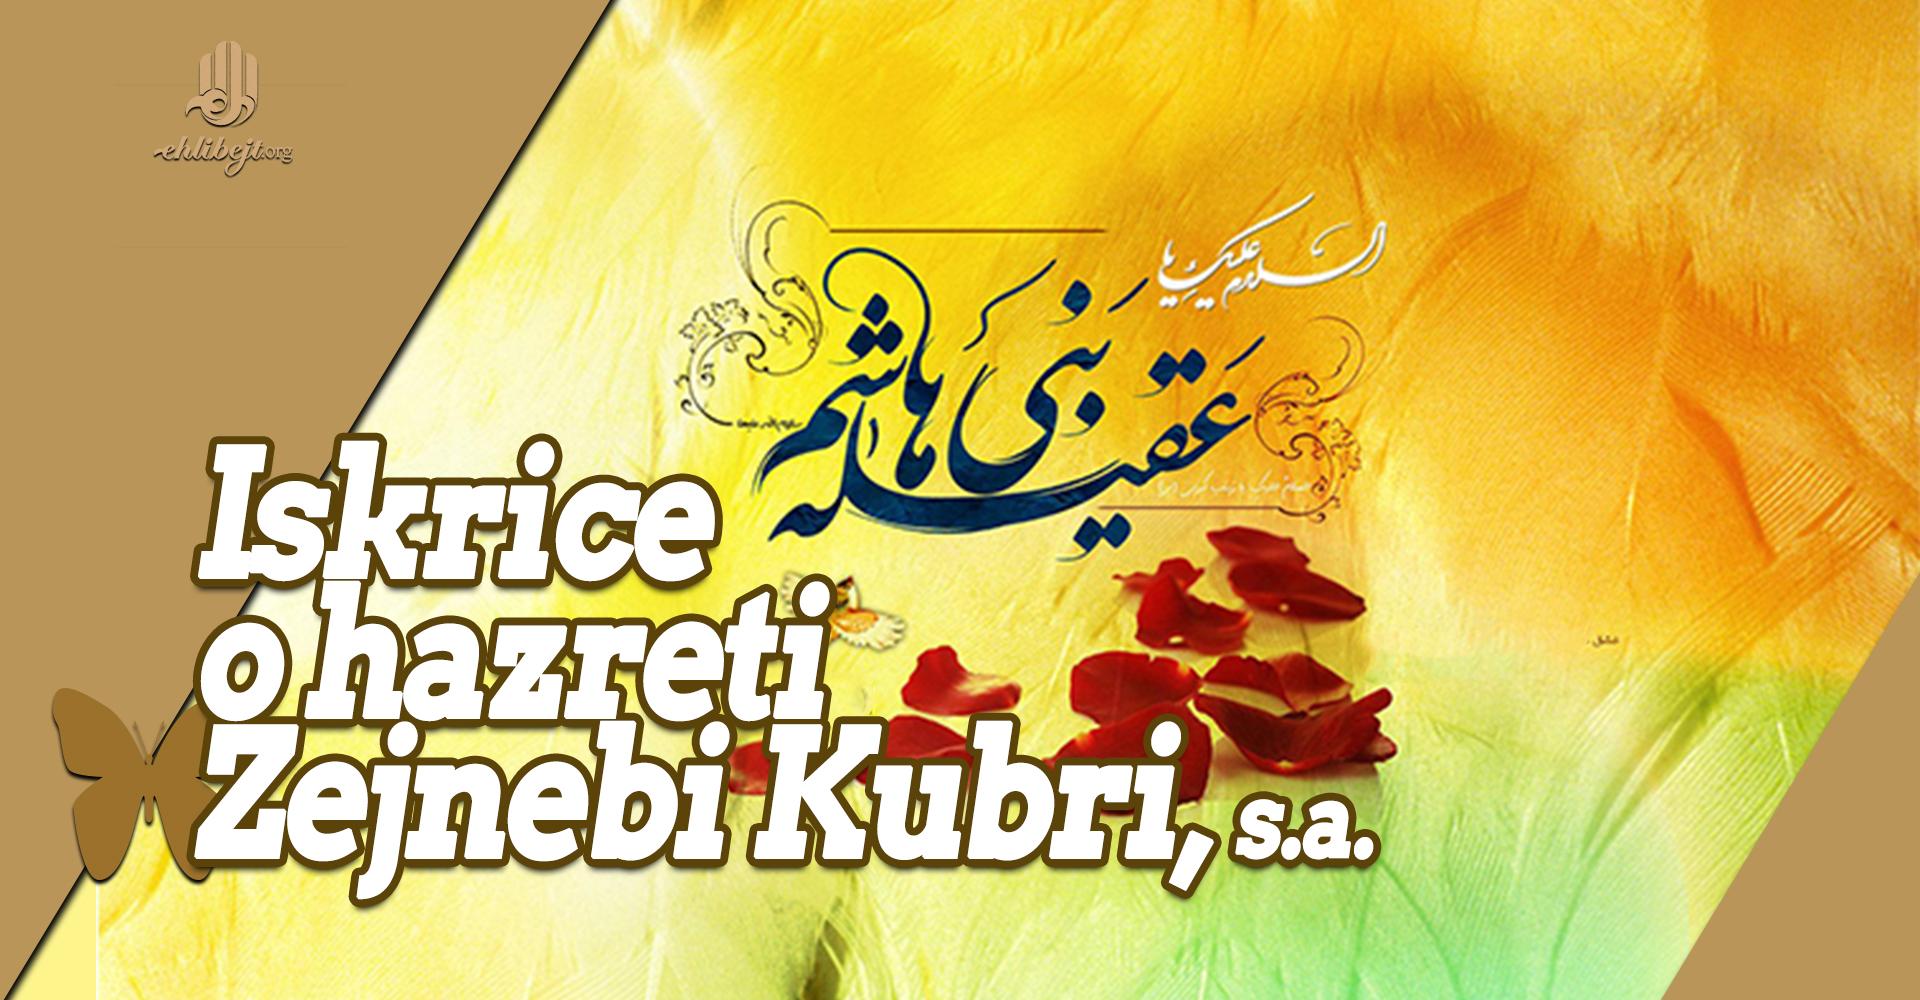 Iskrice o hazreti Zejnebi Kubri, s.a.